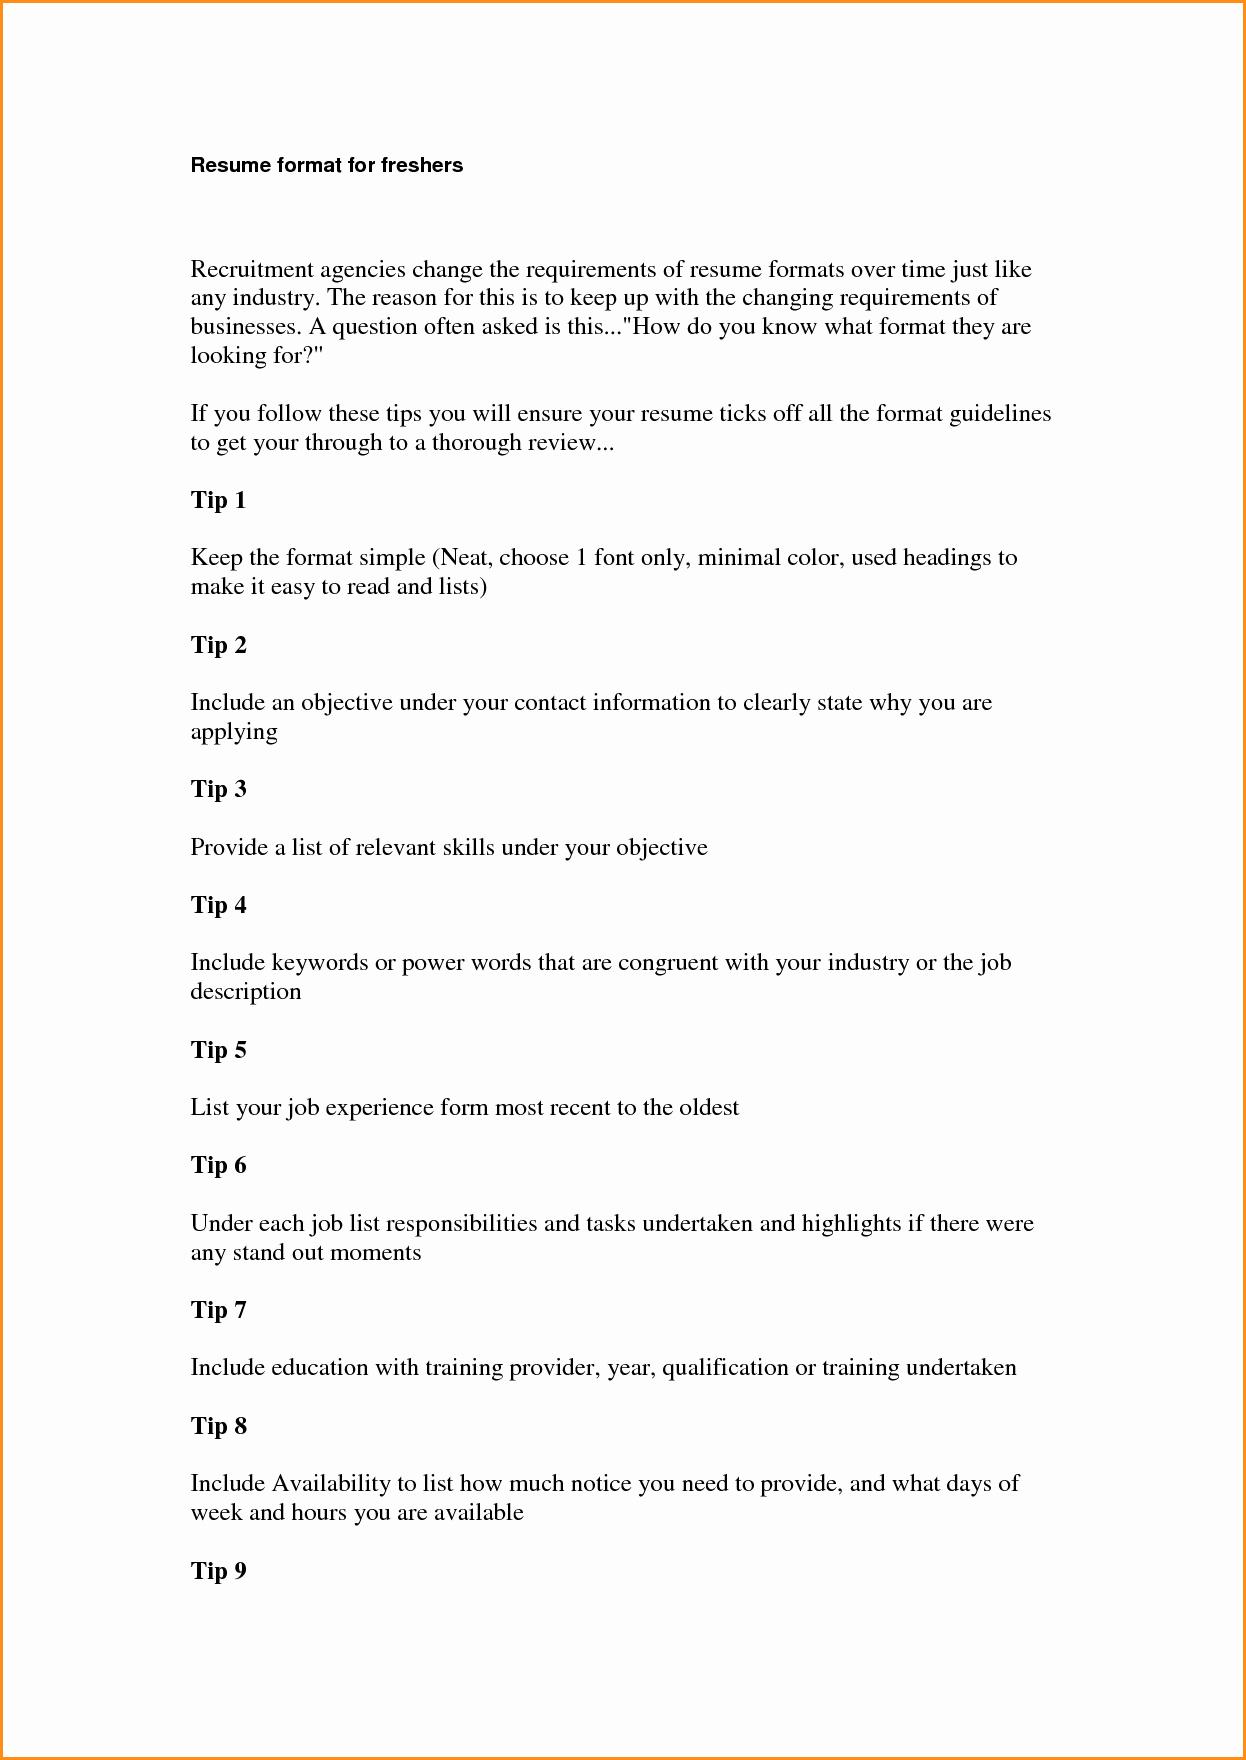 Cv format Samples In Word Beautiful 11 Freshers Resume Samples In Word format